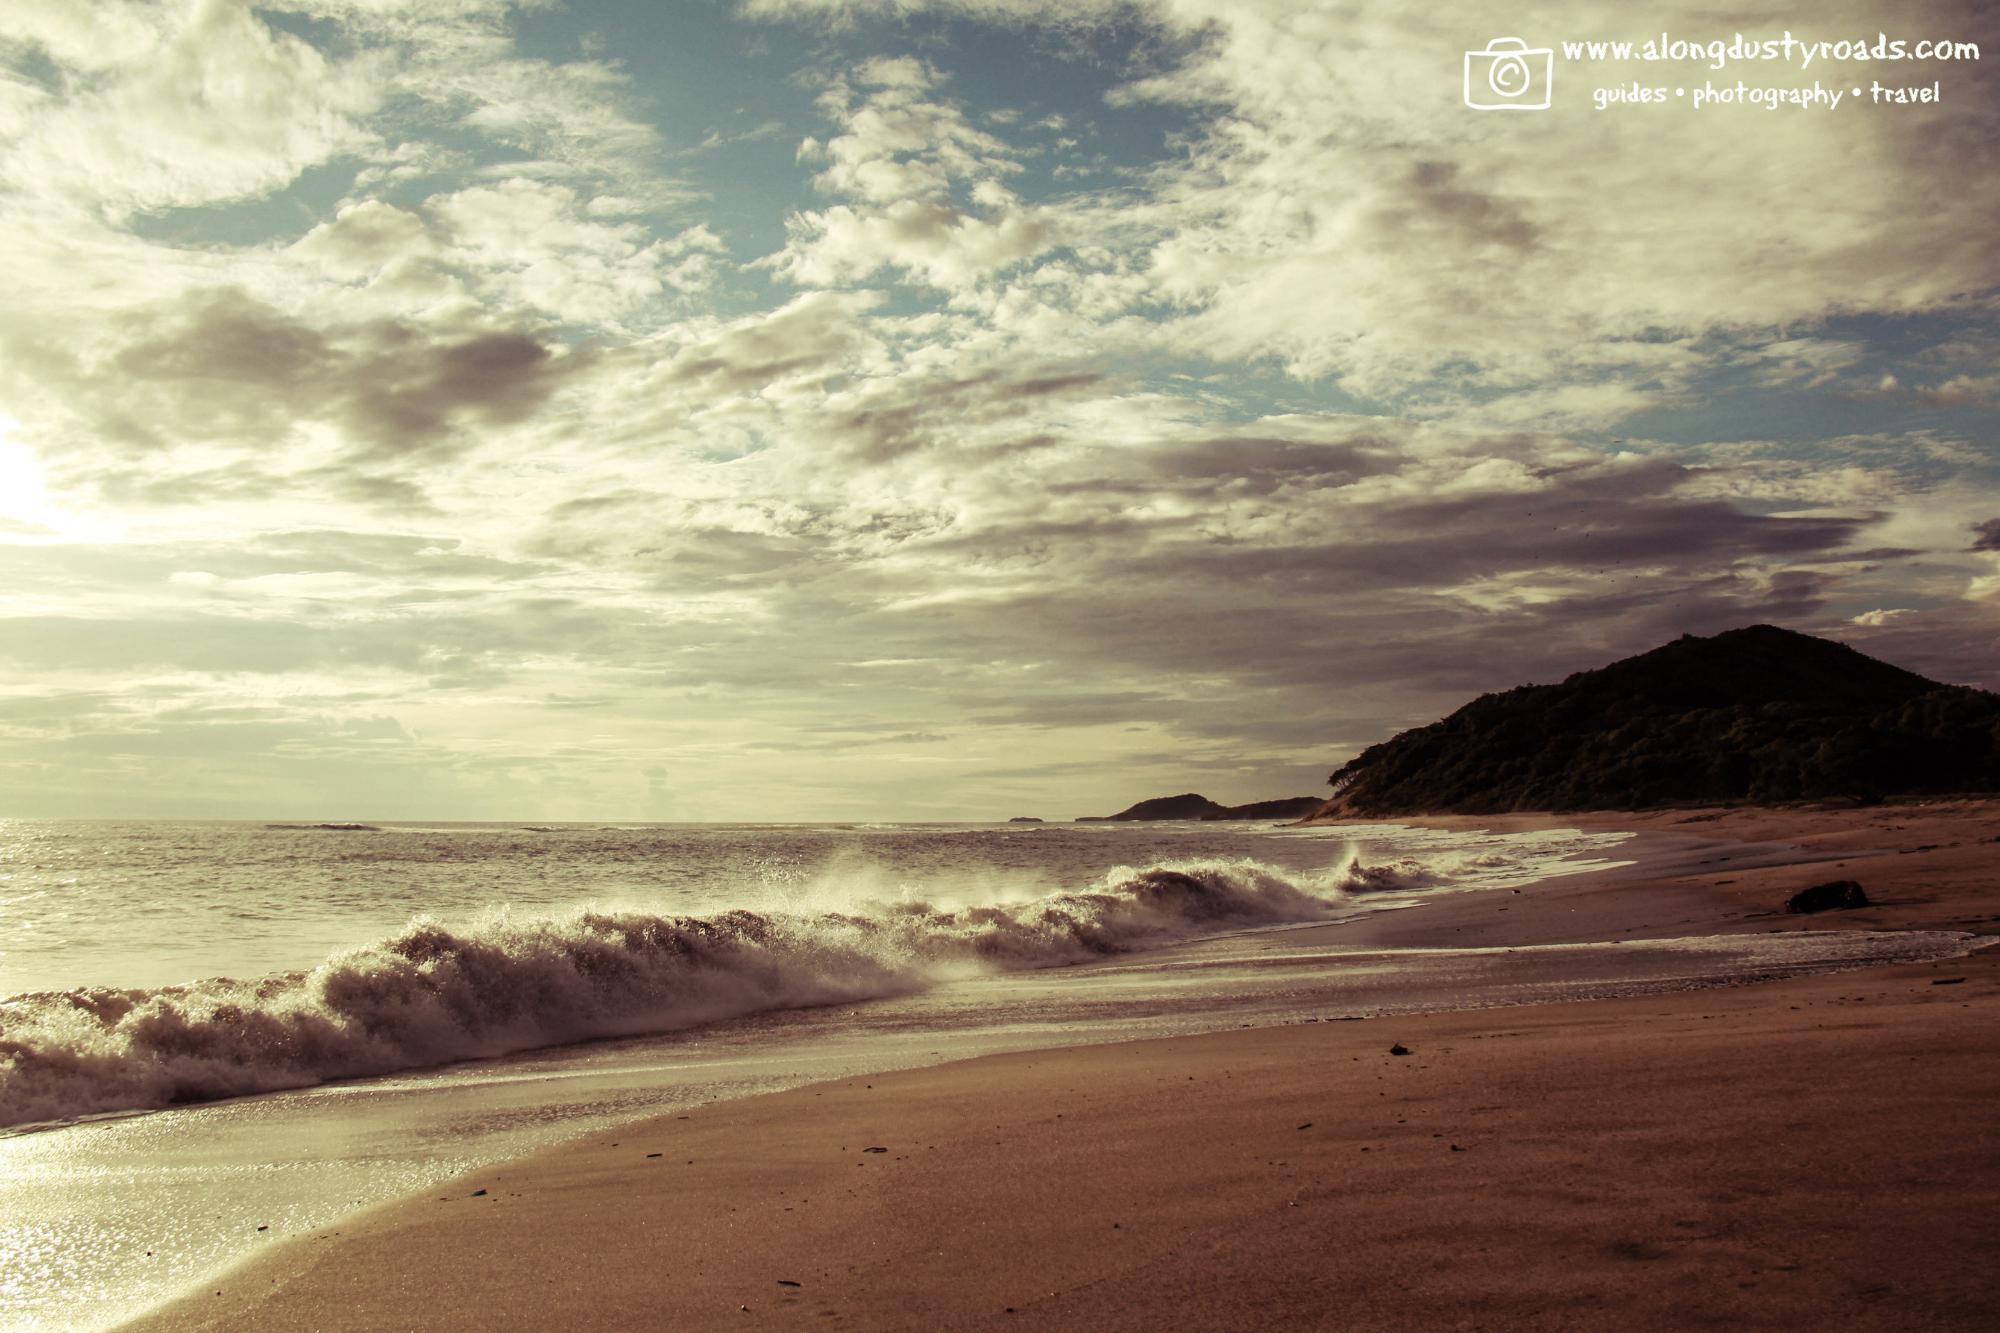 Popoyo Beach, Nicaragua